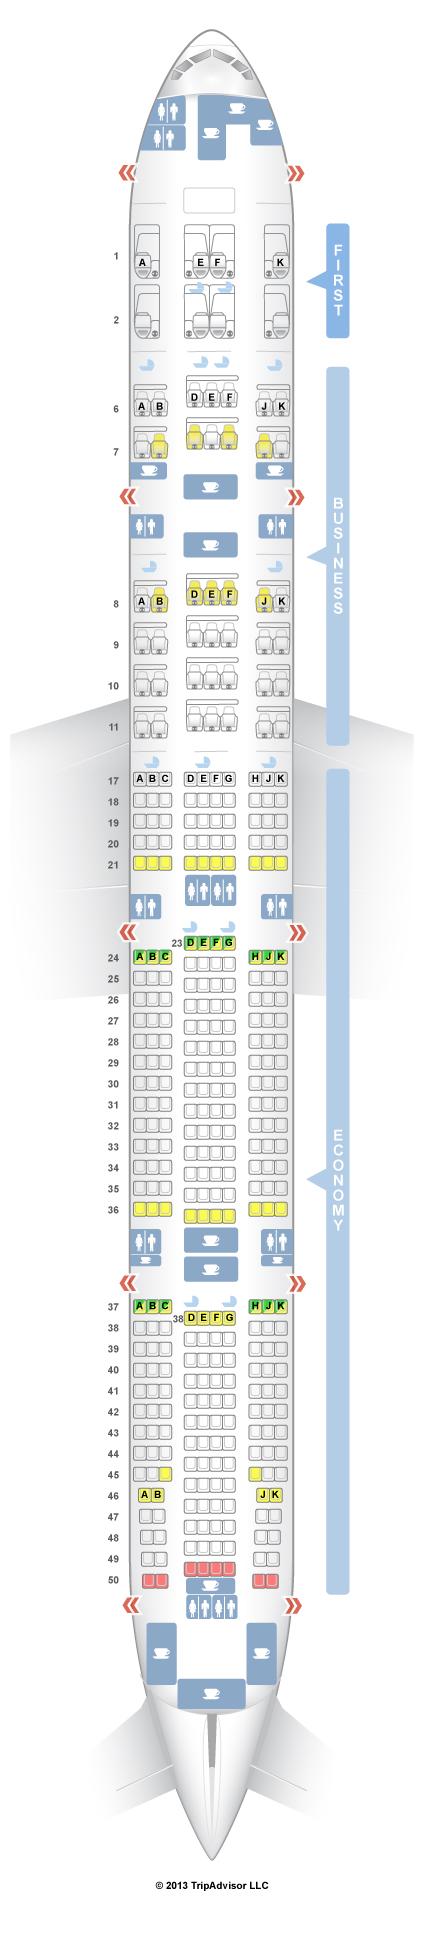 SeatGuru Seat Map Emirates Boeing 777 300ER (77W) Three Class V2